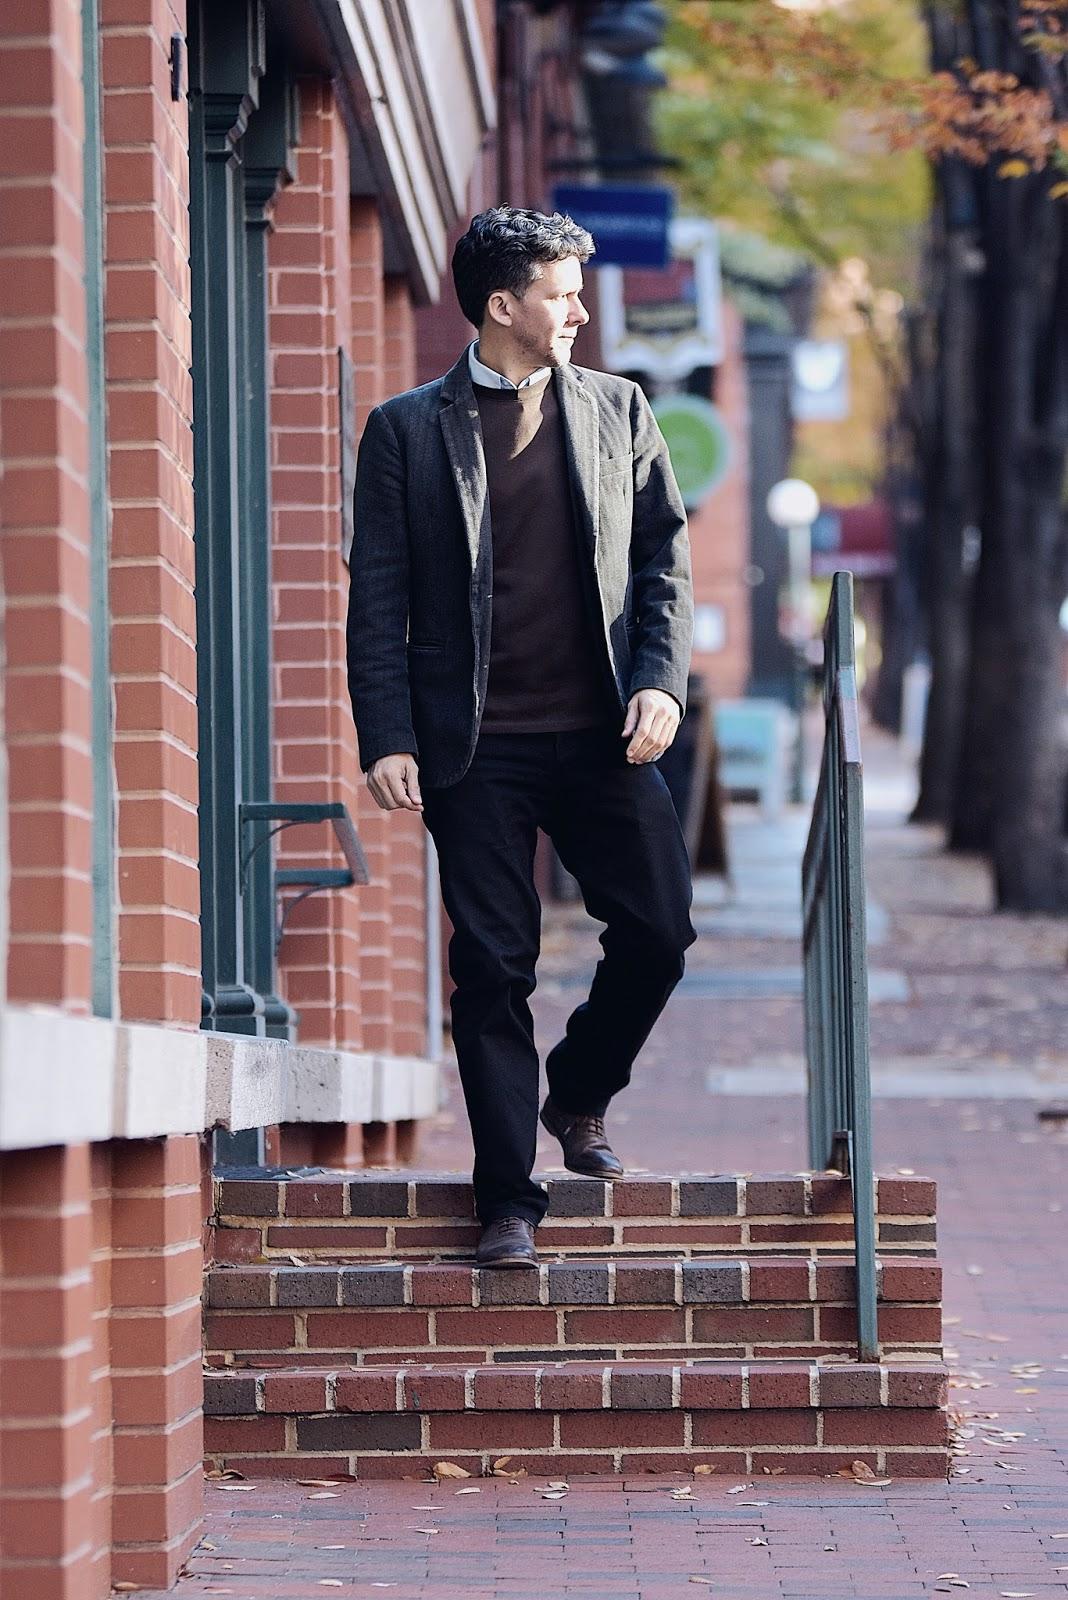 Visit Richmond Virginia-Virginia Is For Lovers-Mari Estilo- Look of the day-fashionblogger- los chuchis-mariestilotravels-zaful-lightinthebox-nine west-travelblogger